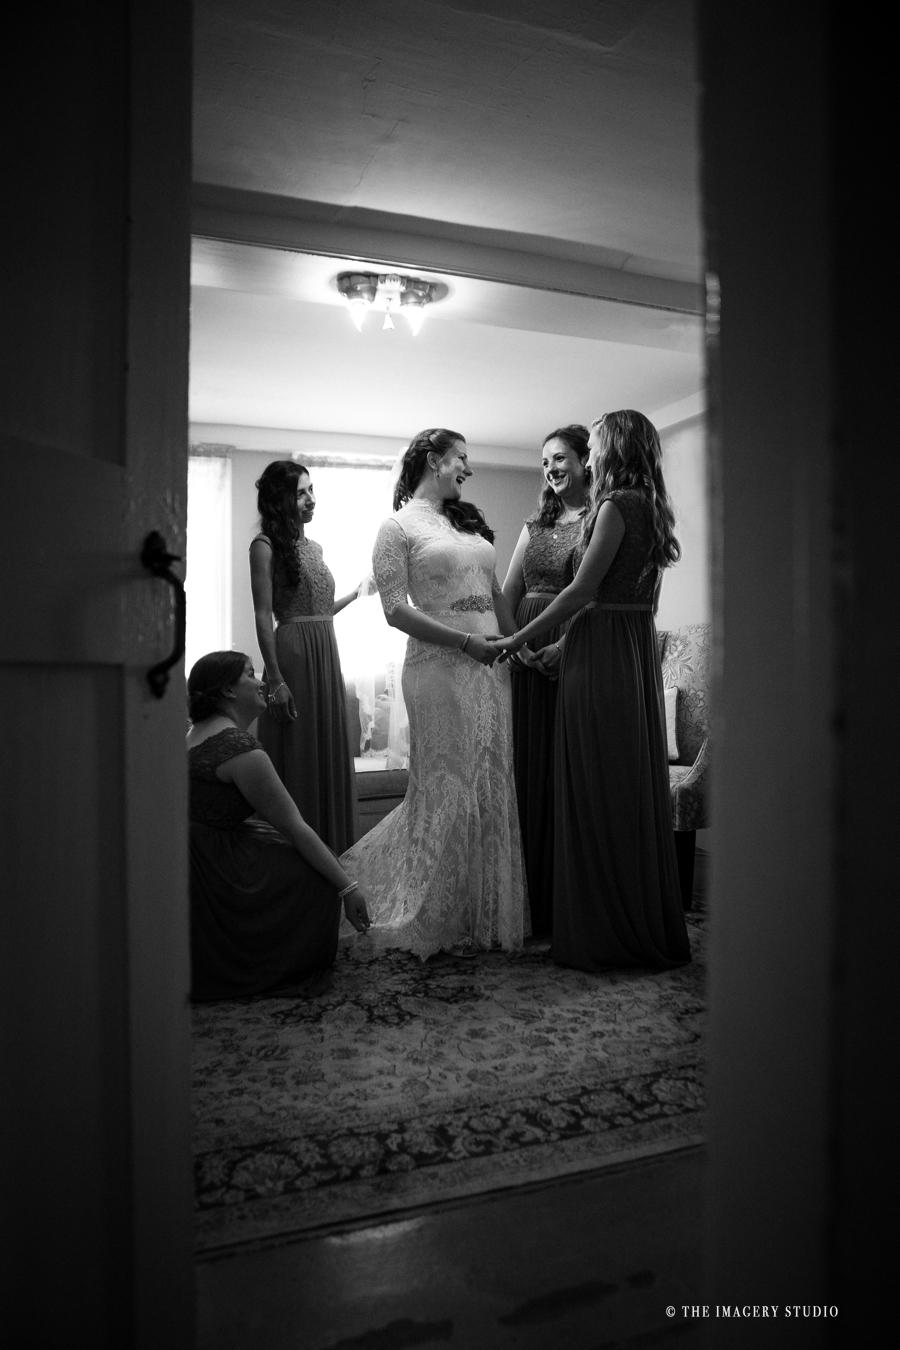 Bride getting ready with bridesmaids at a harrington farm wedding